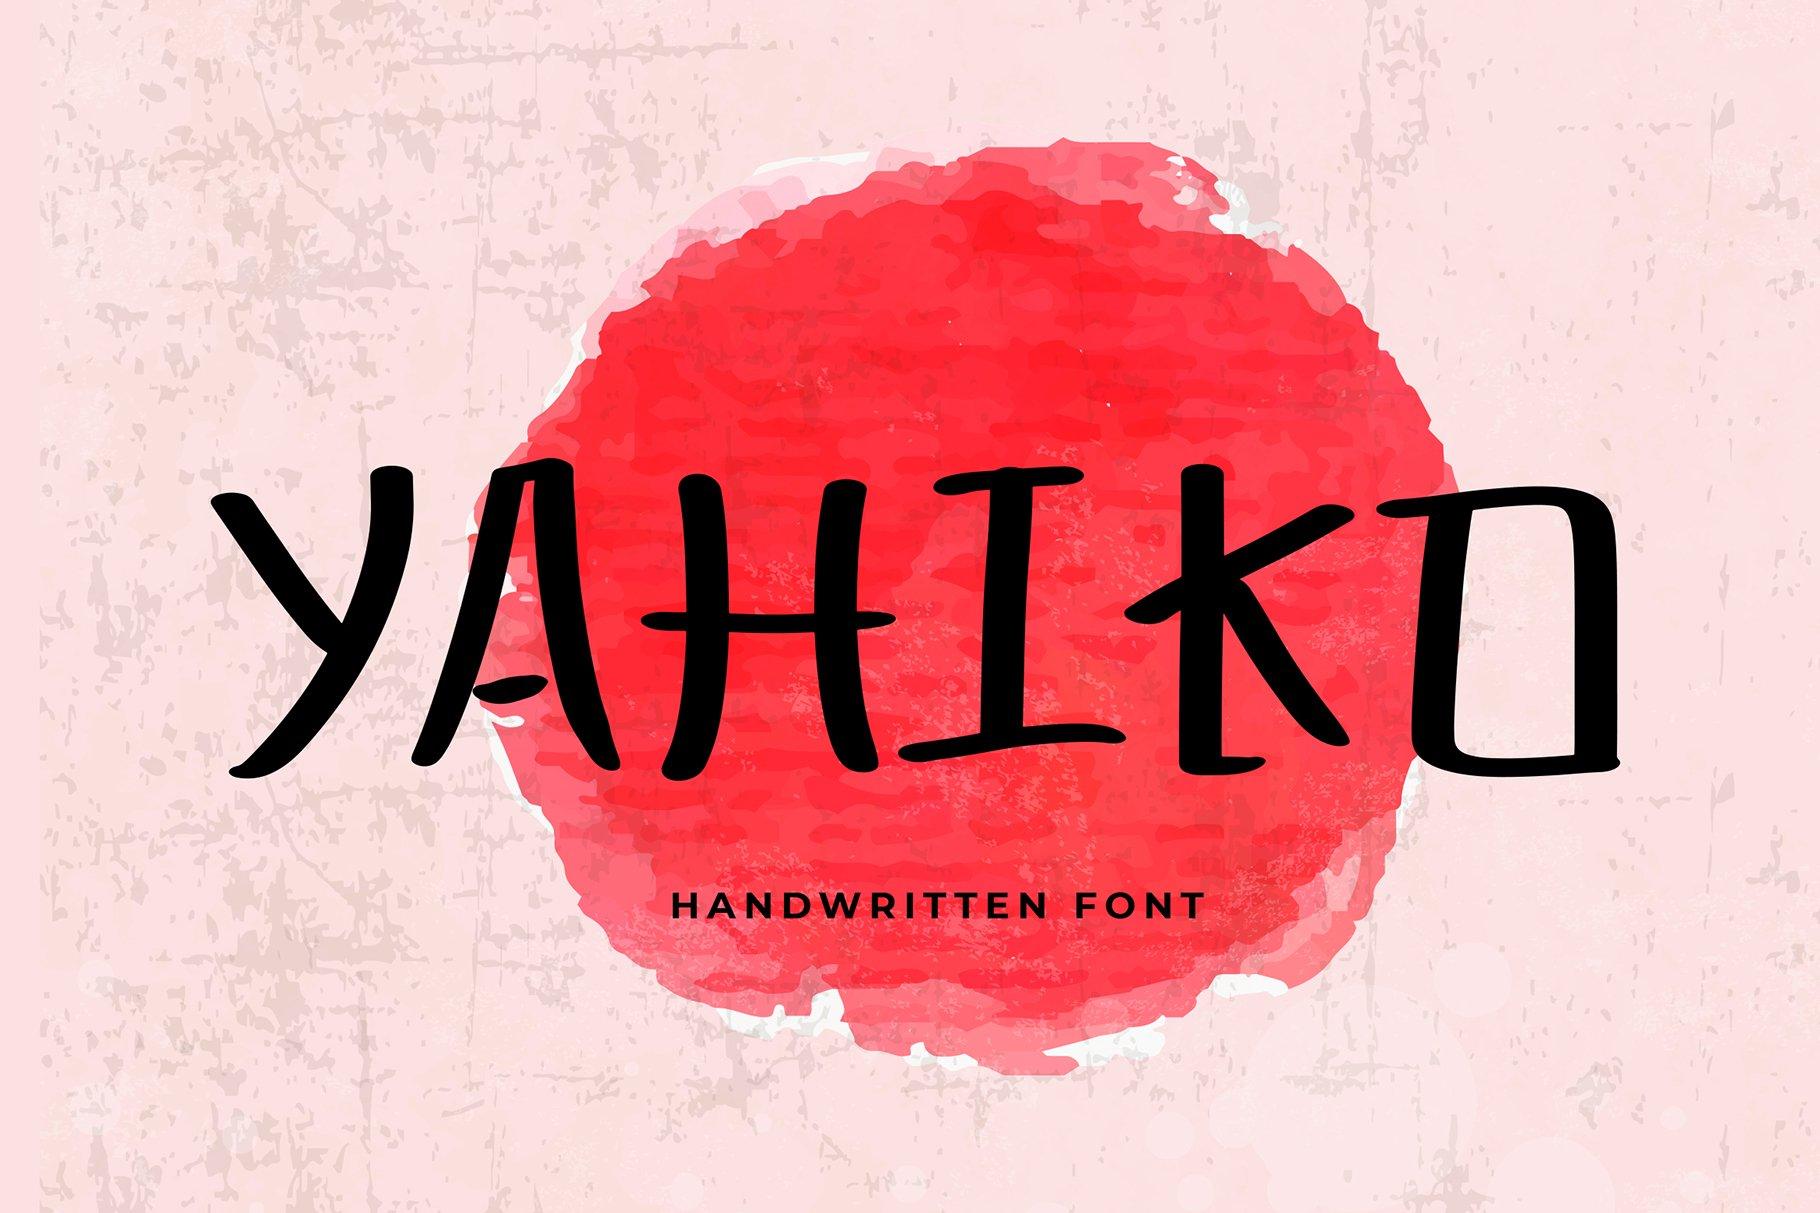 Yahiko Playful Handwritten Font example image 1